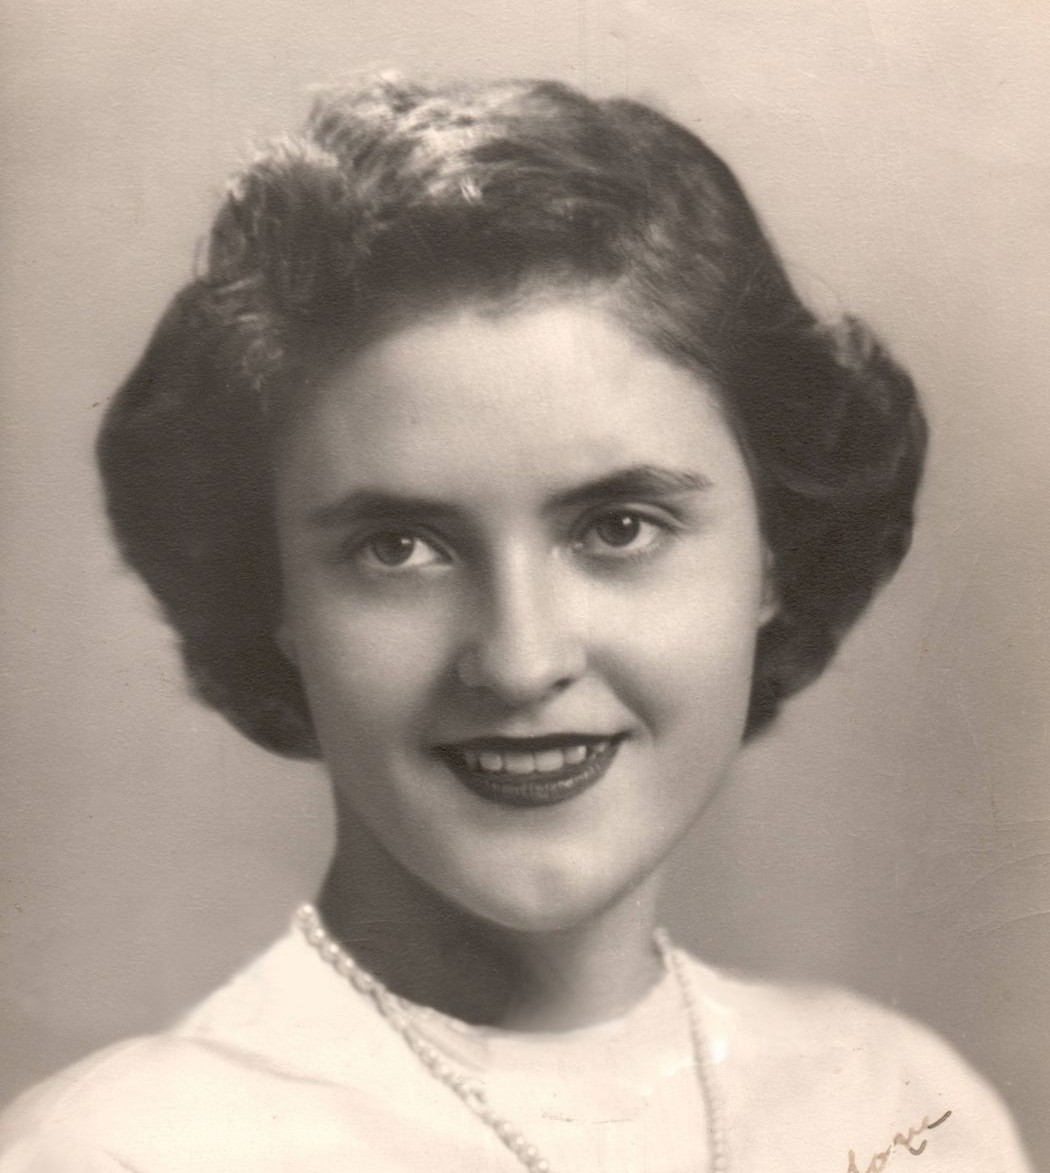 Rita Byram